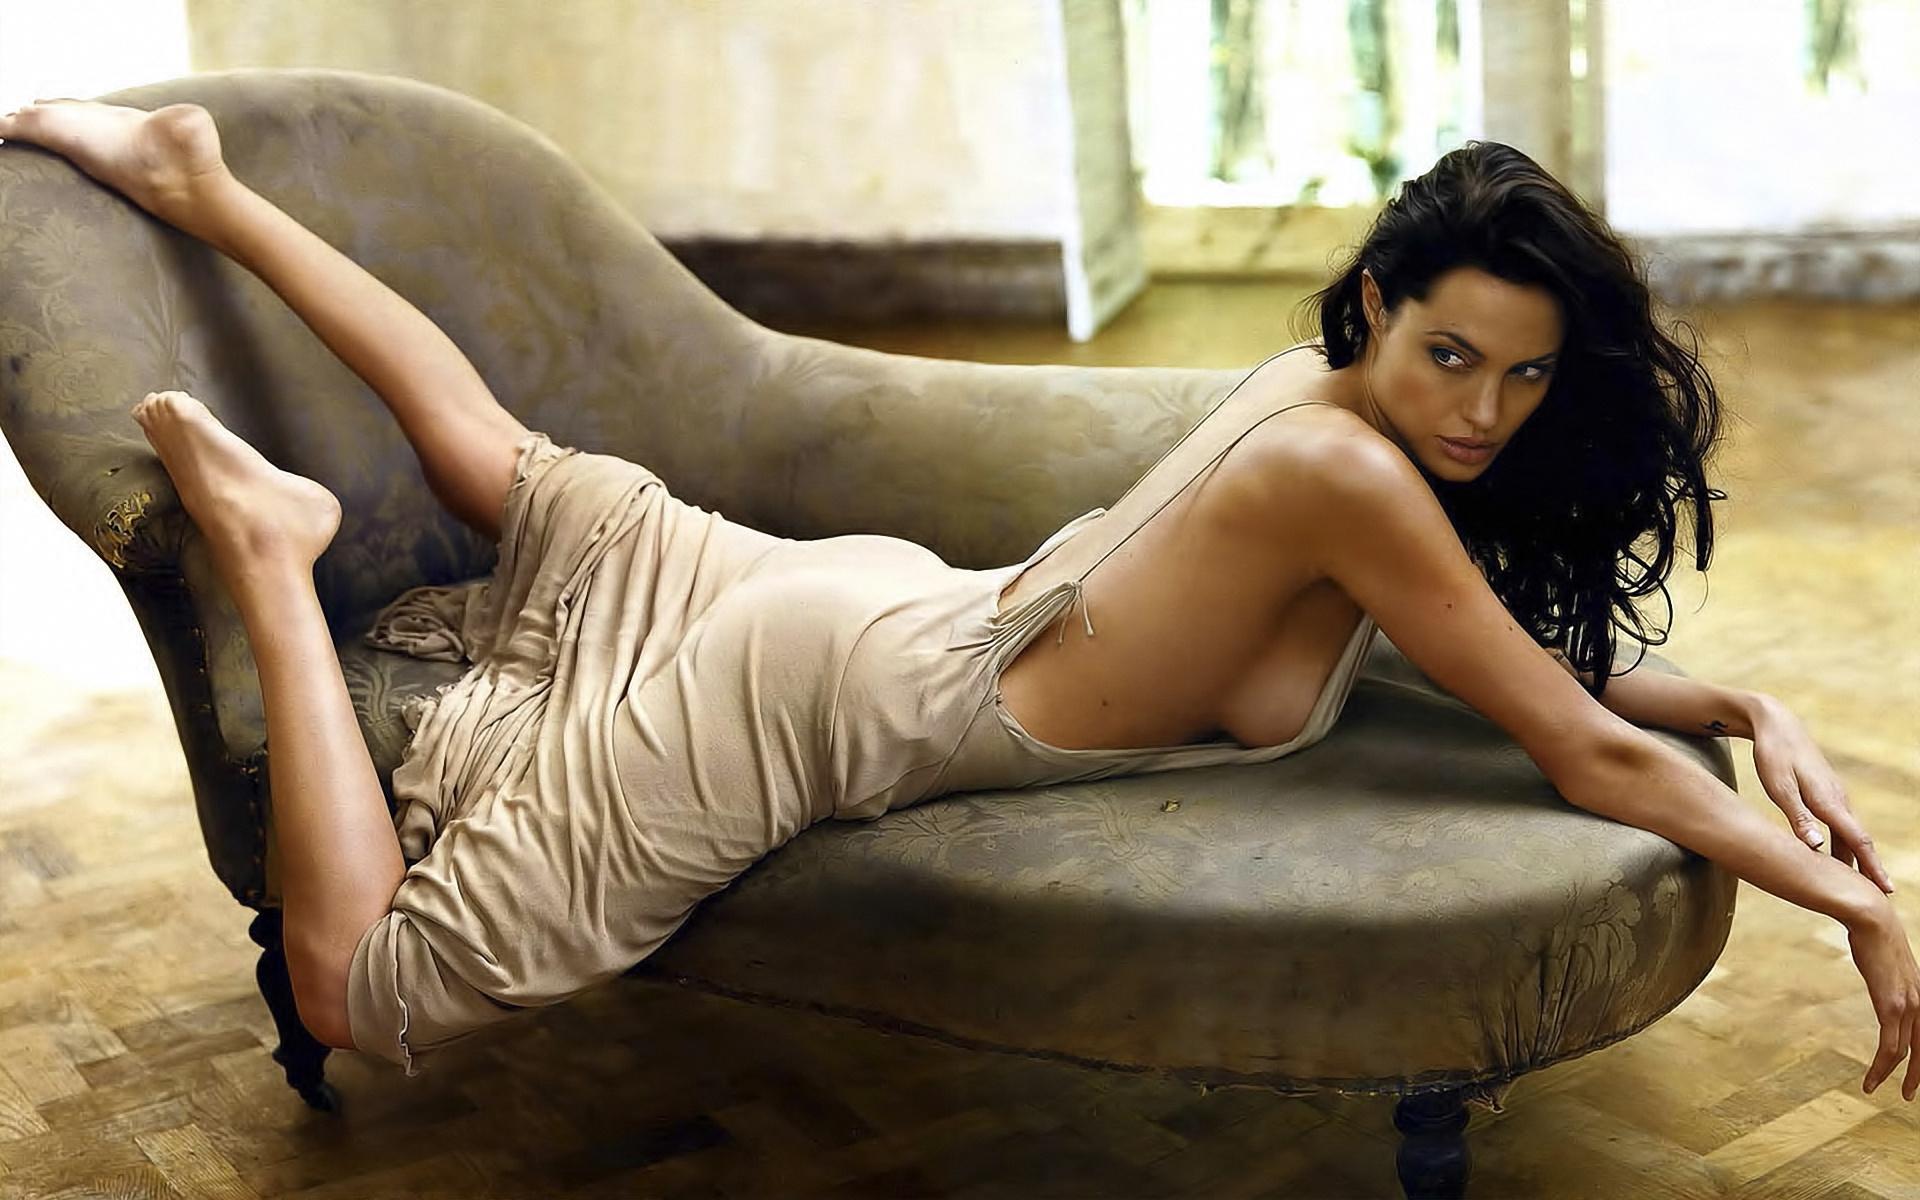 Undressing beauty Nora Noir caught on camera in her living room № 491428  скачать